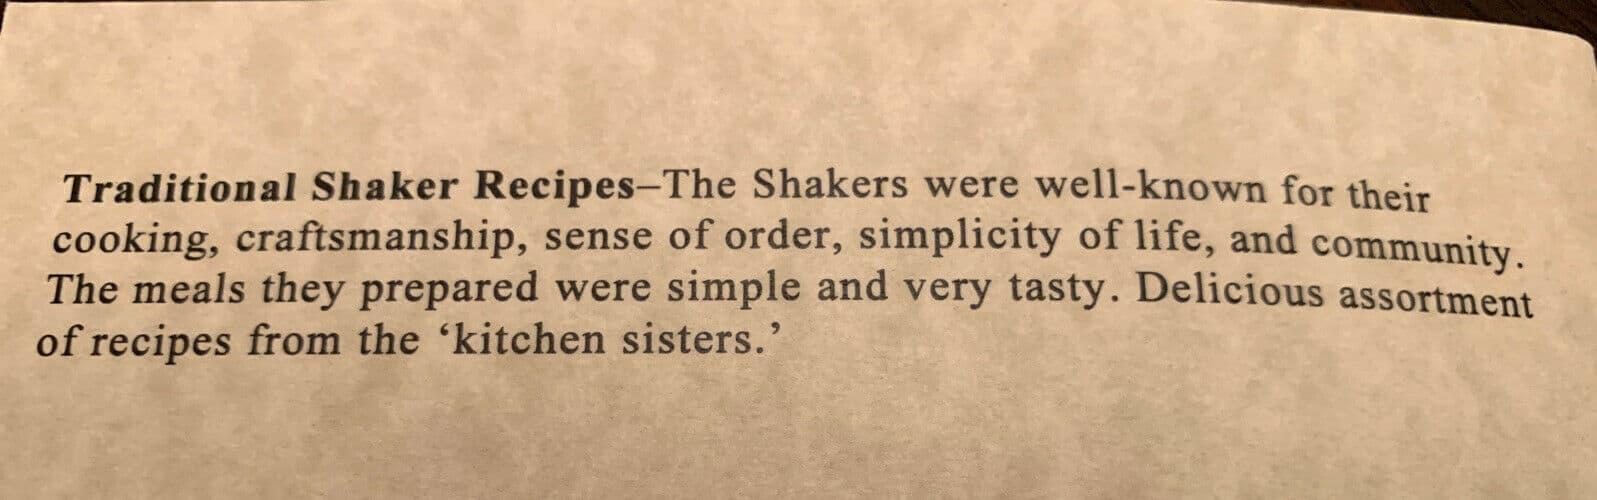 Traditional Shaker Recipes